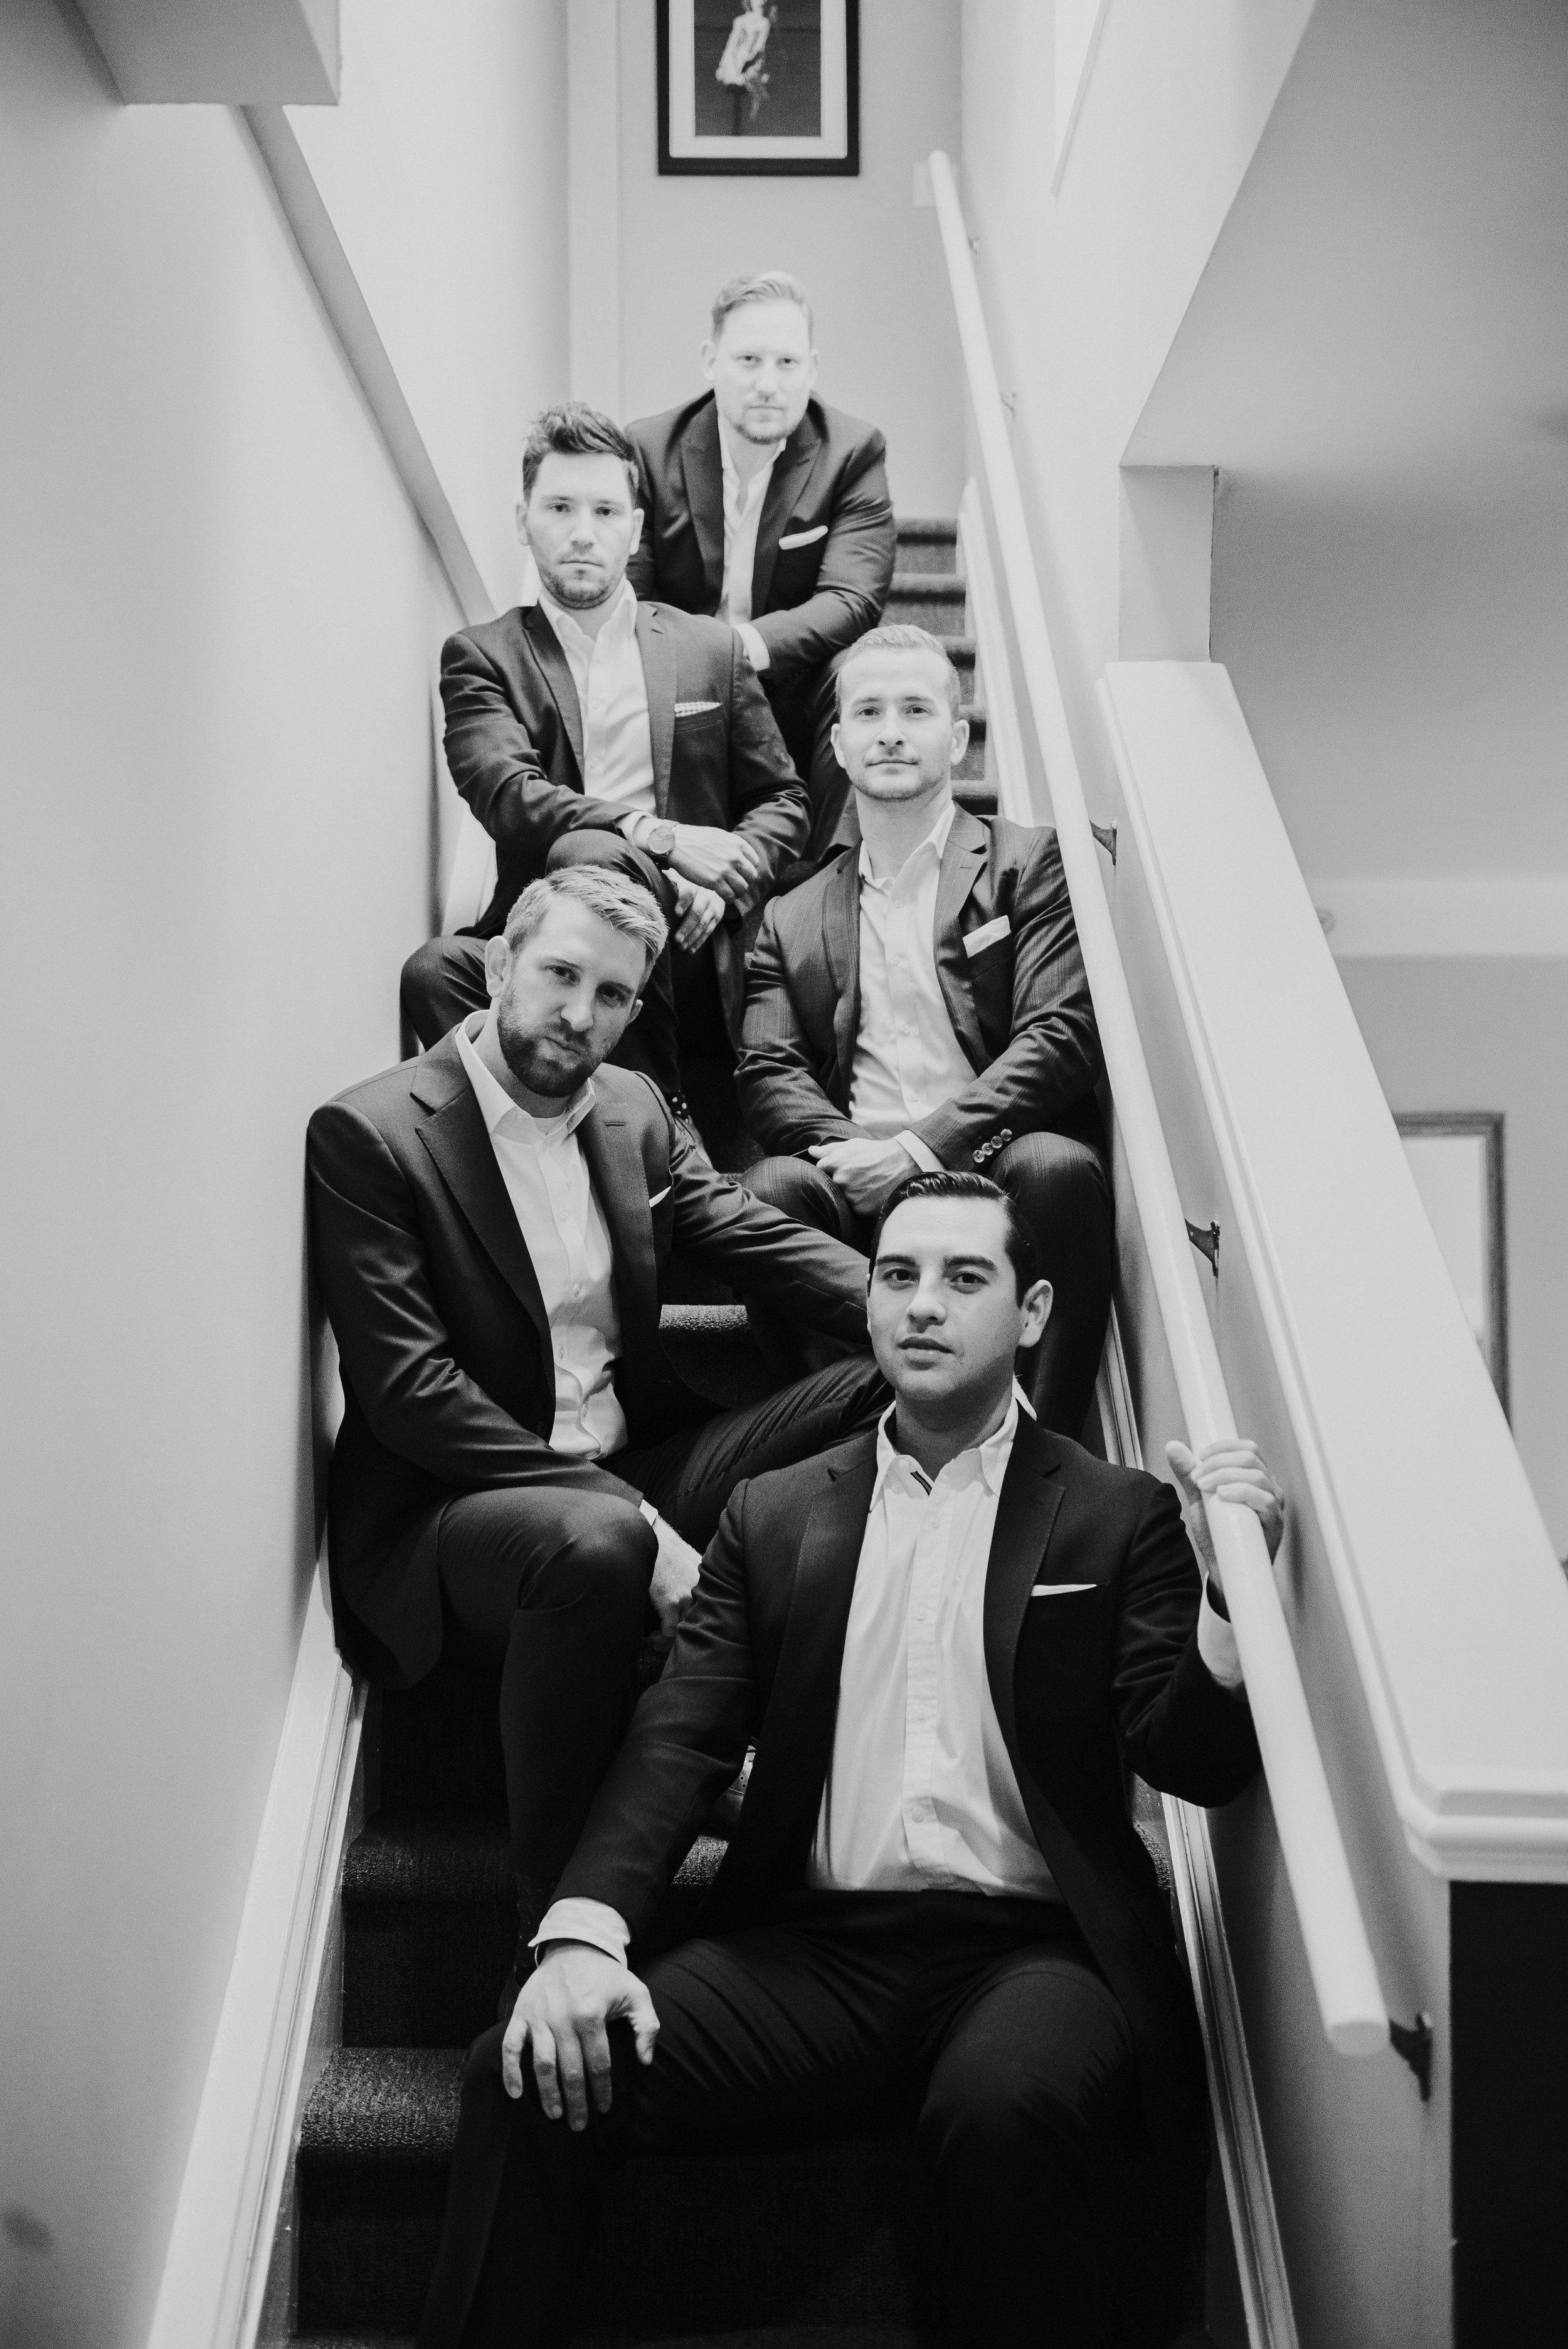 Groom and groomsmen on stairs at Artmore Hotel in Atlanta, GA